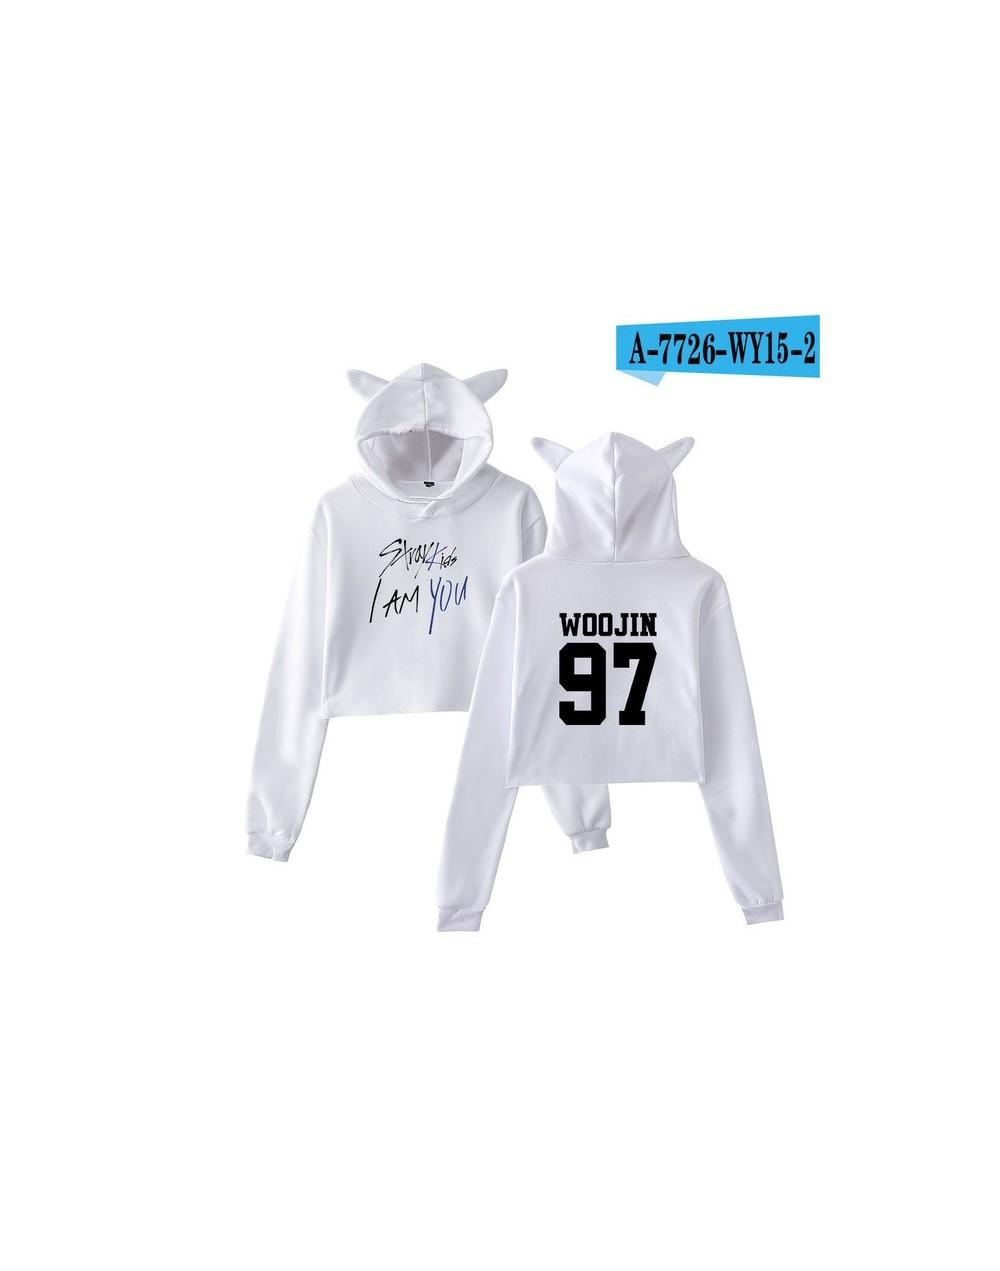 kpop 2018 Stray Kids I Am You Idol Changbin 99 Print oversized hoodies sweatshirts Women Sex Crop Top Cat clothes 2XL - whit...